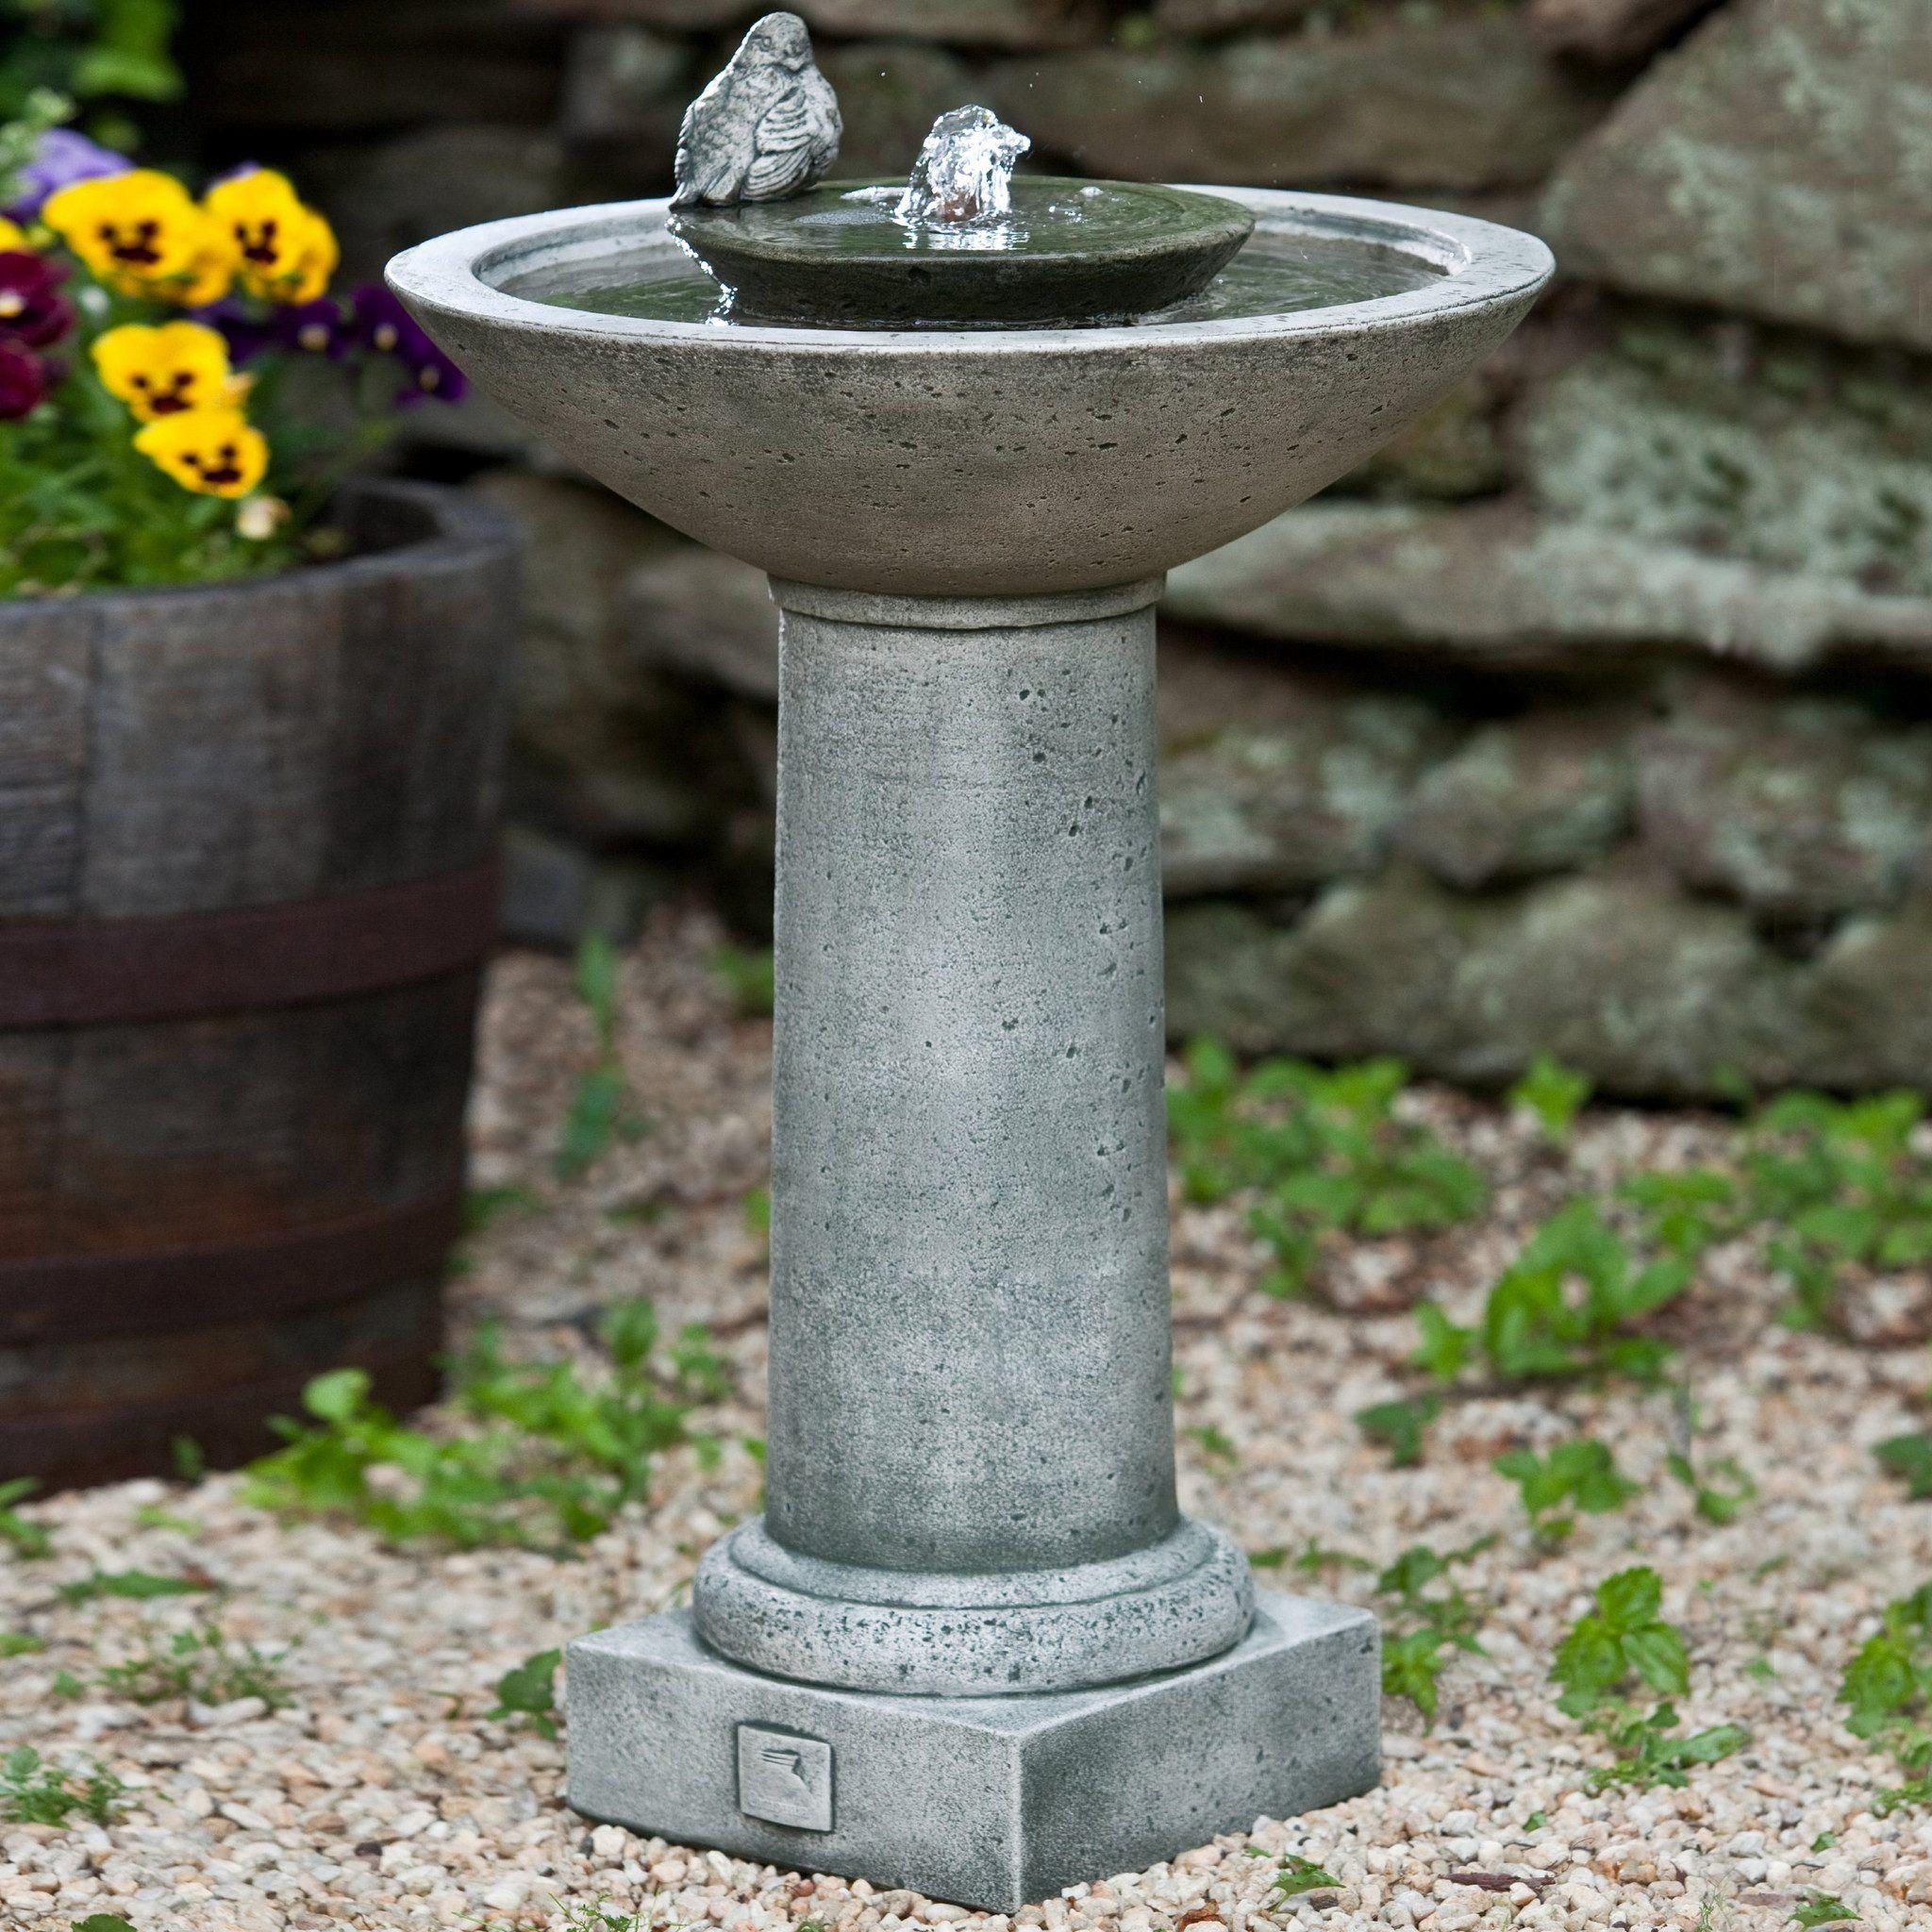 Garden water features  Aya Bird Water Fountain  Outside  Pinterest  Water fountains